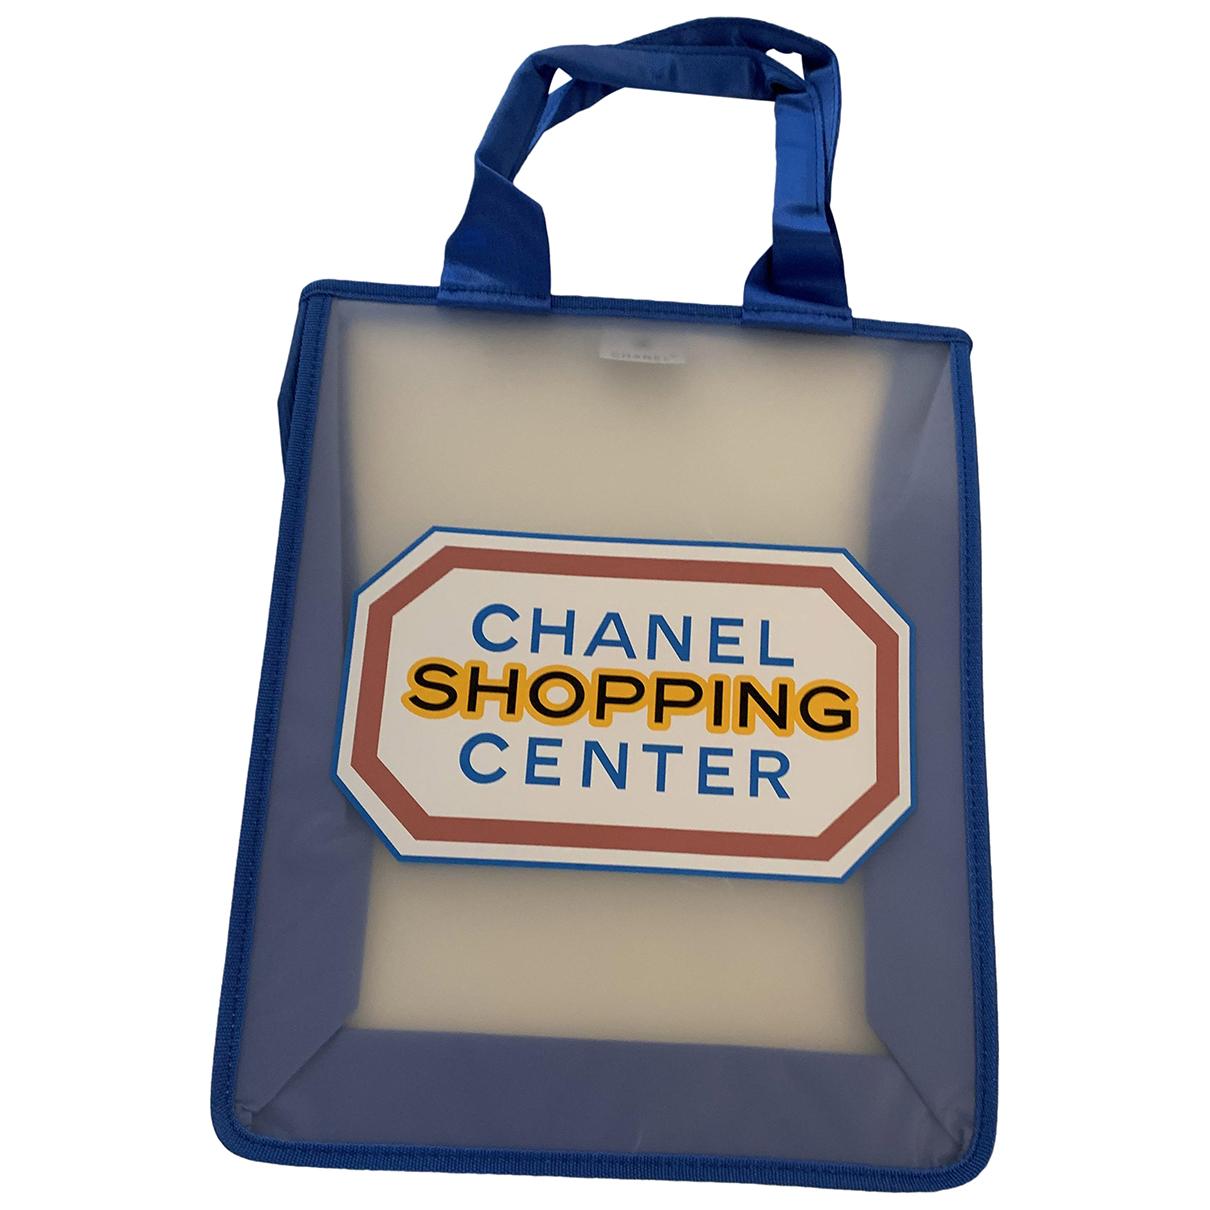 Chanel - Sac a main   pour femme en toile - bleu